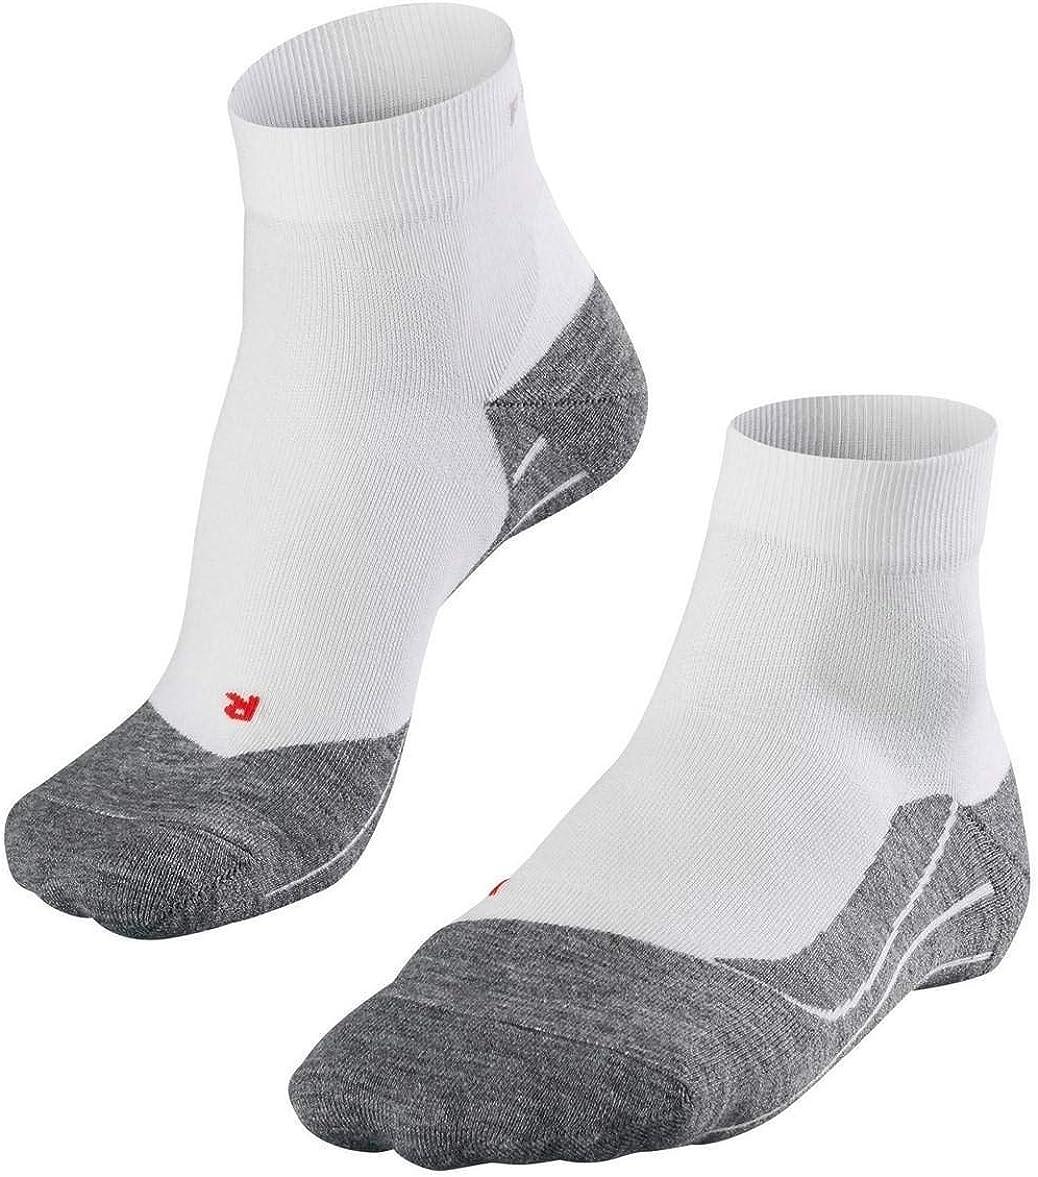 White Mix Falke Mens Running 4 Medium Short Socks